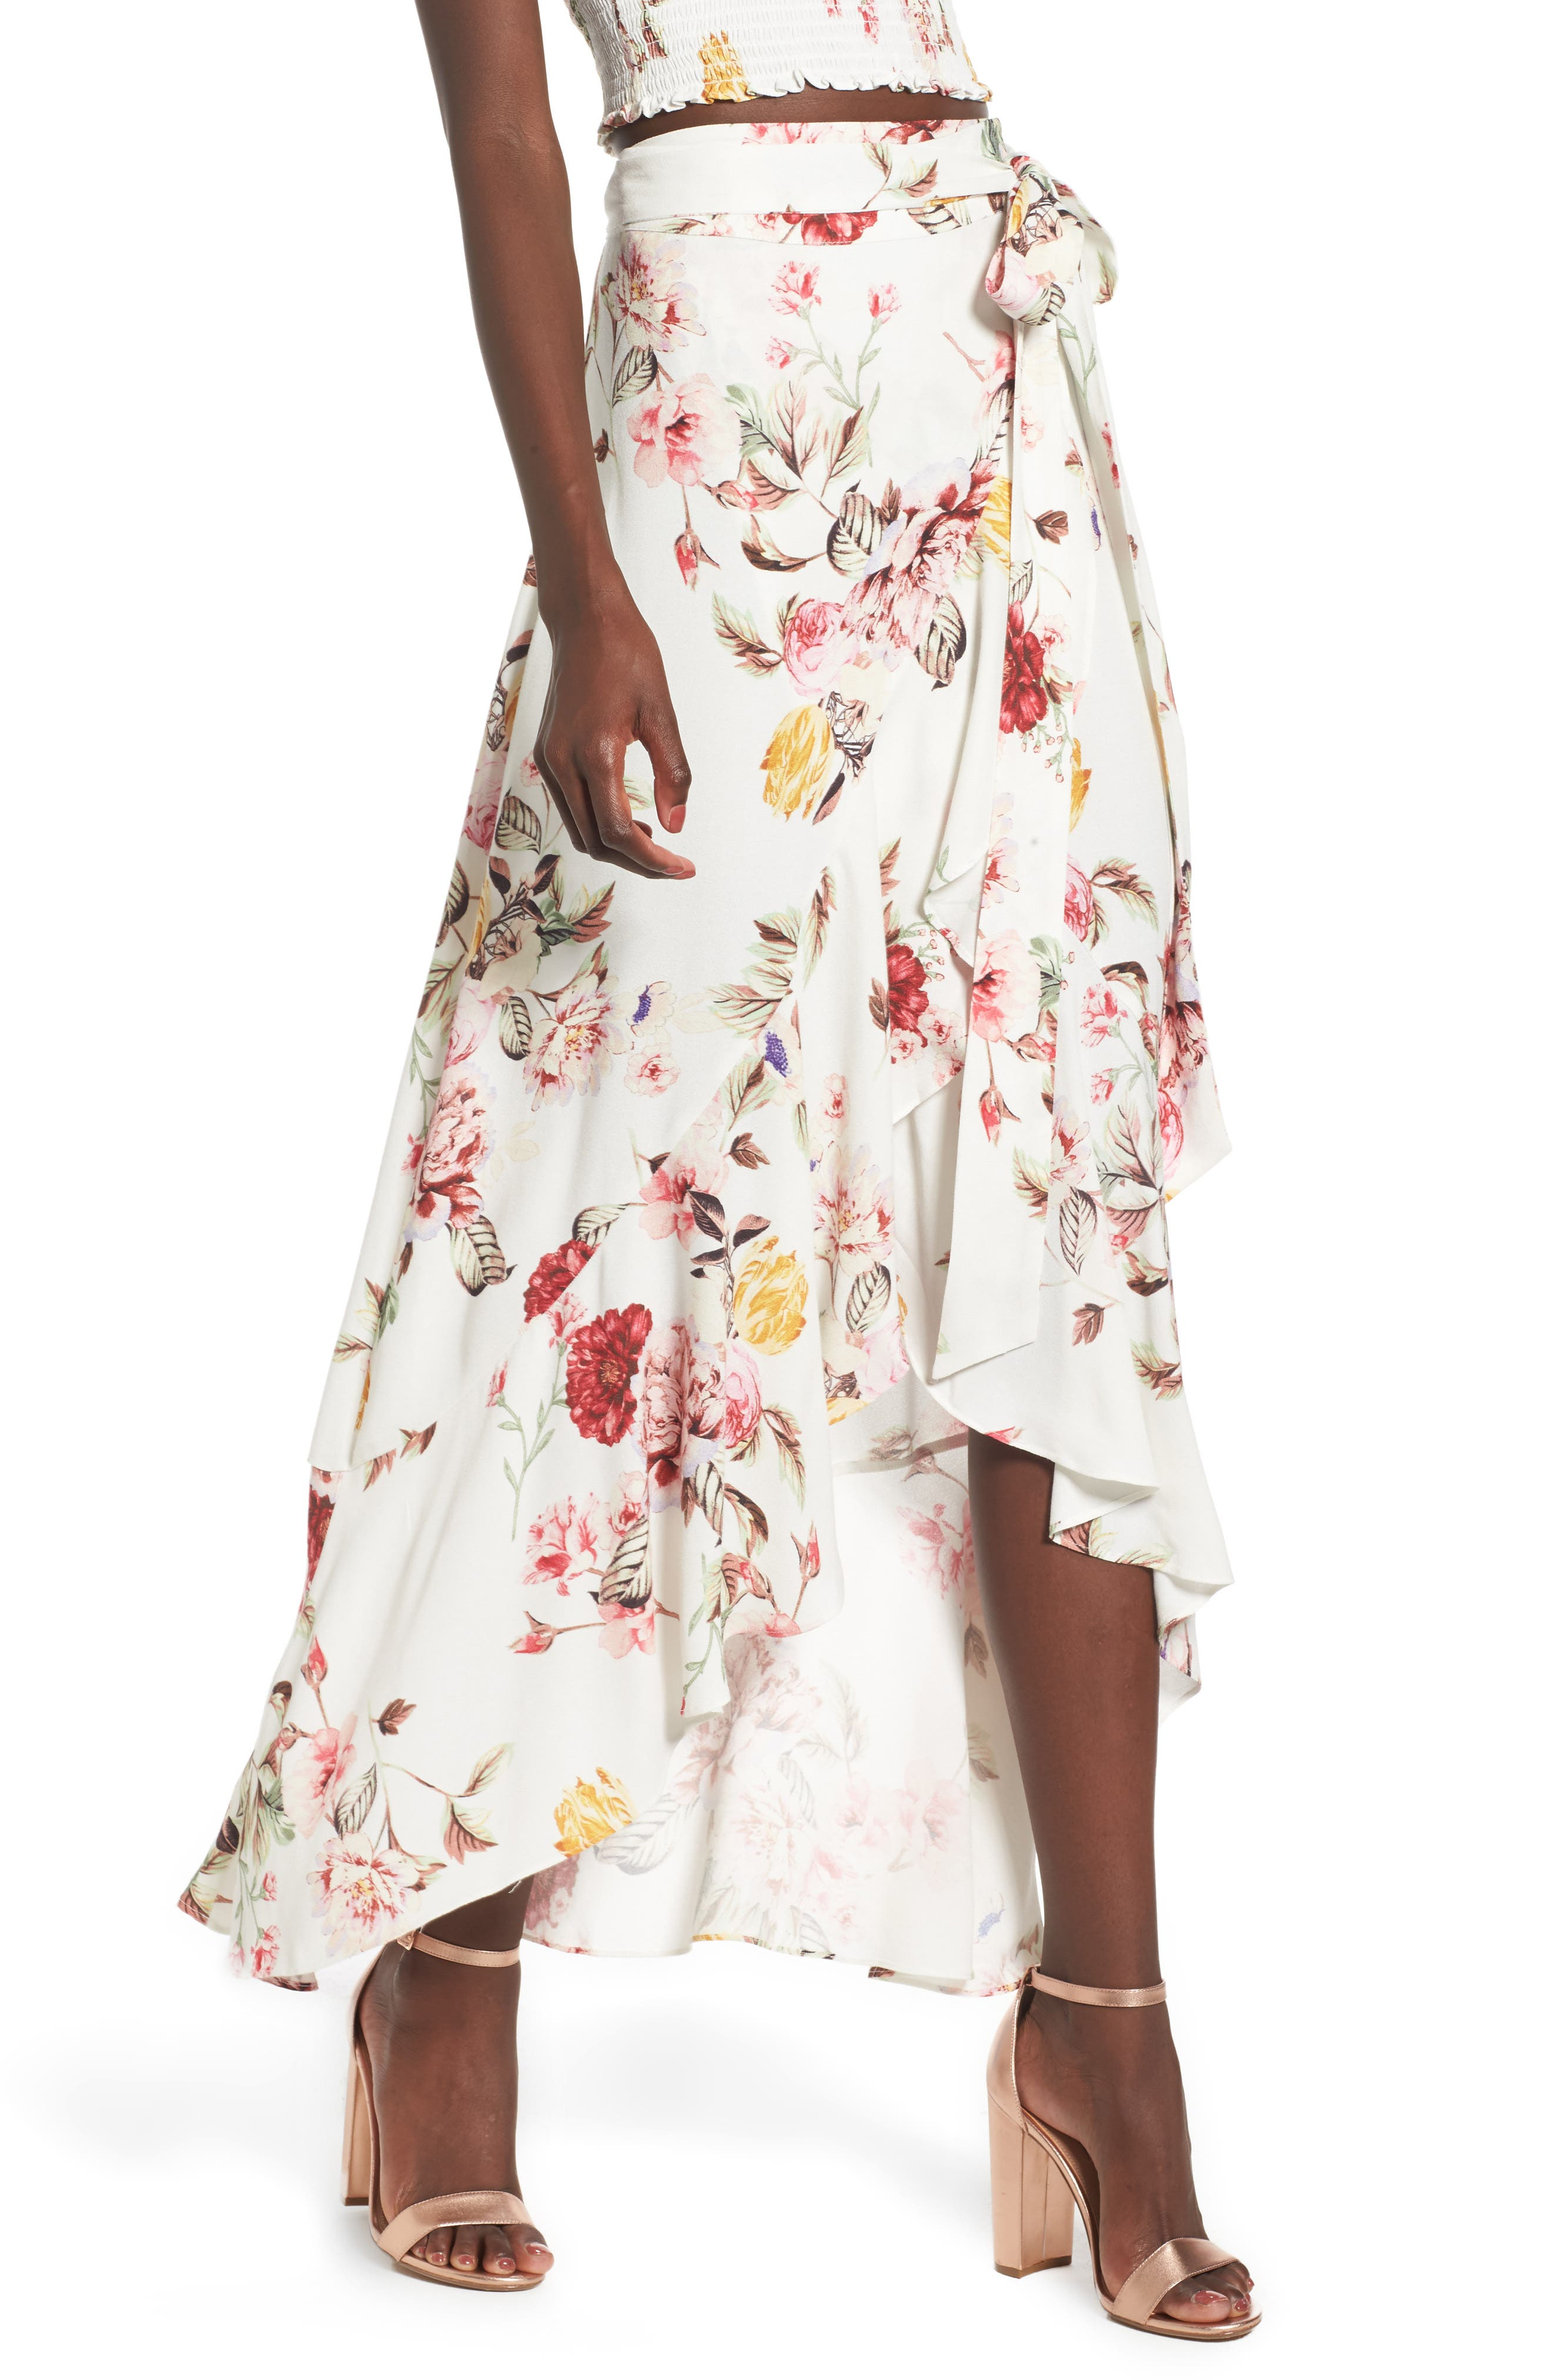 ARRIVE Amelia Ruffle Wrap Skirt